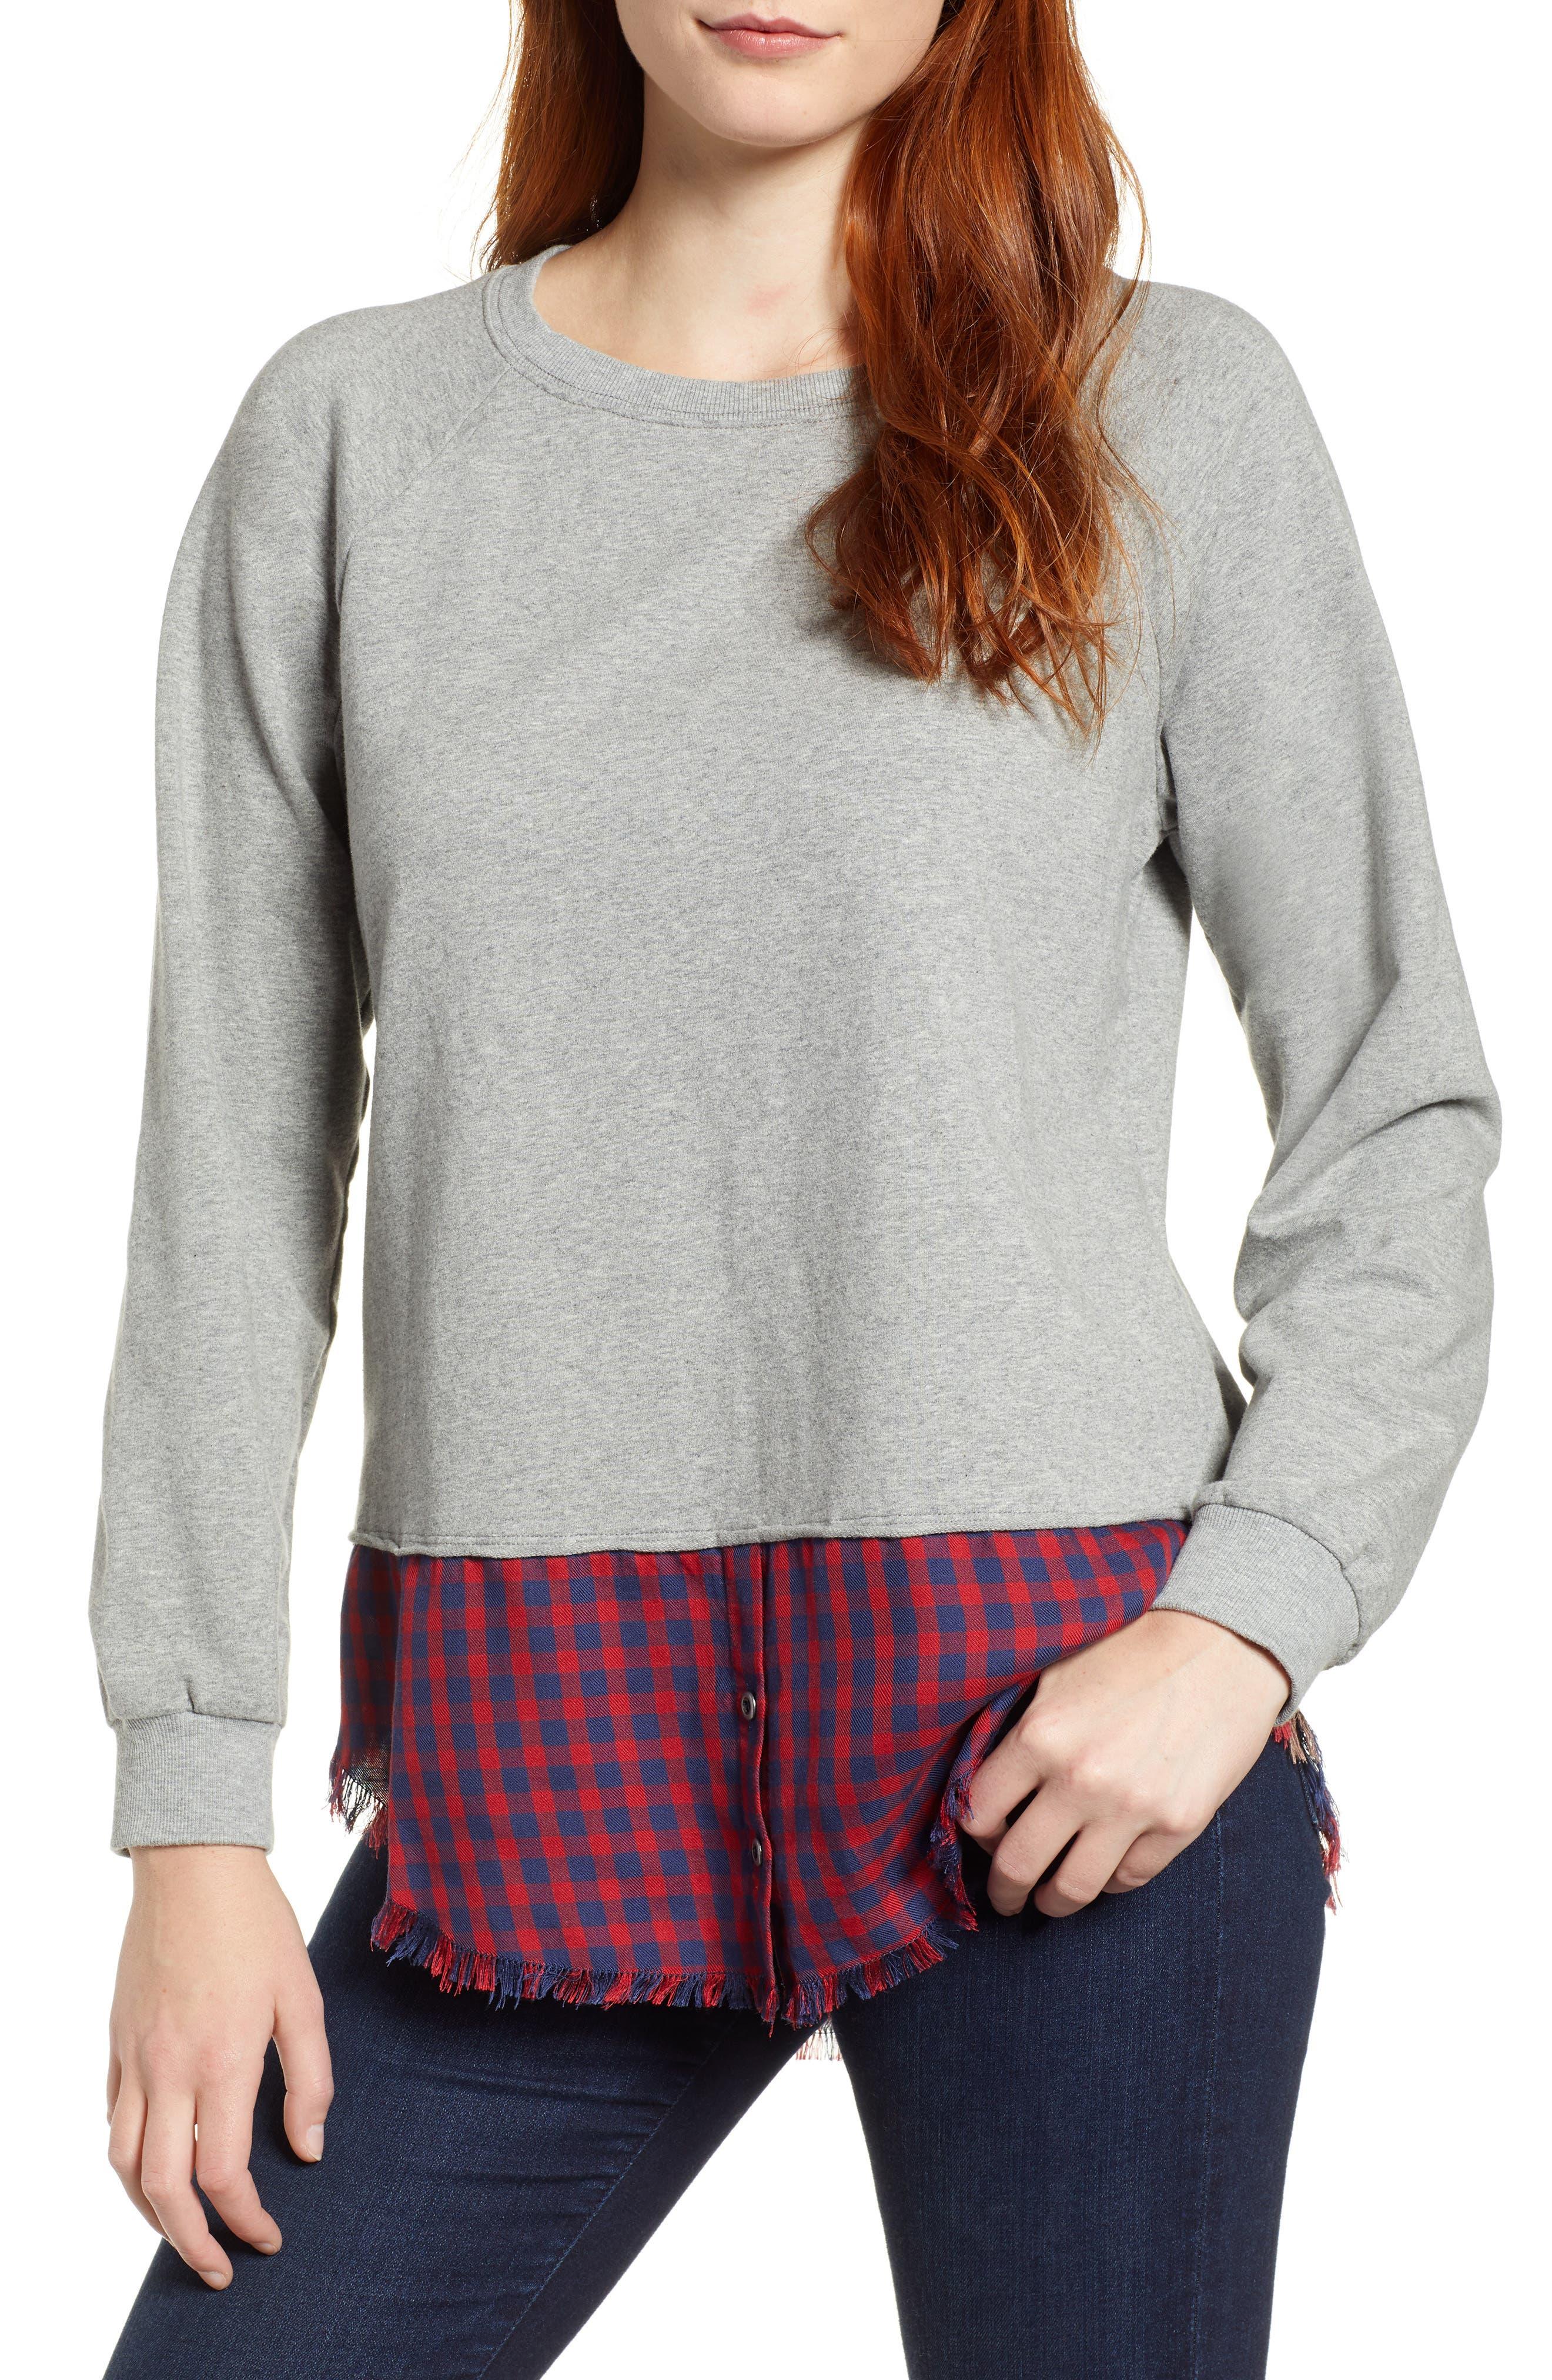 BILLY T Plaid Shirttail Sweatshirt in Heather Grey/ Red Mix Plaid